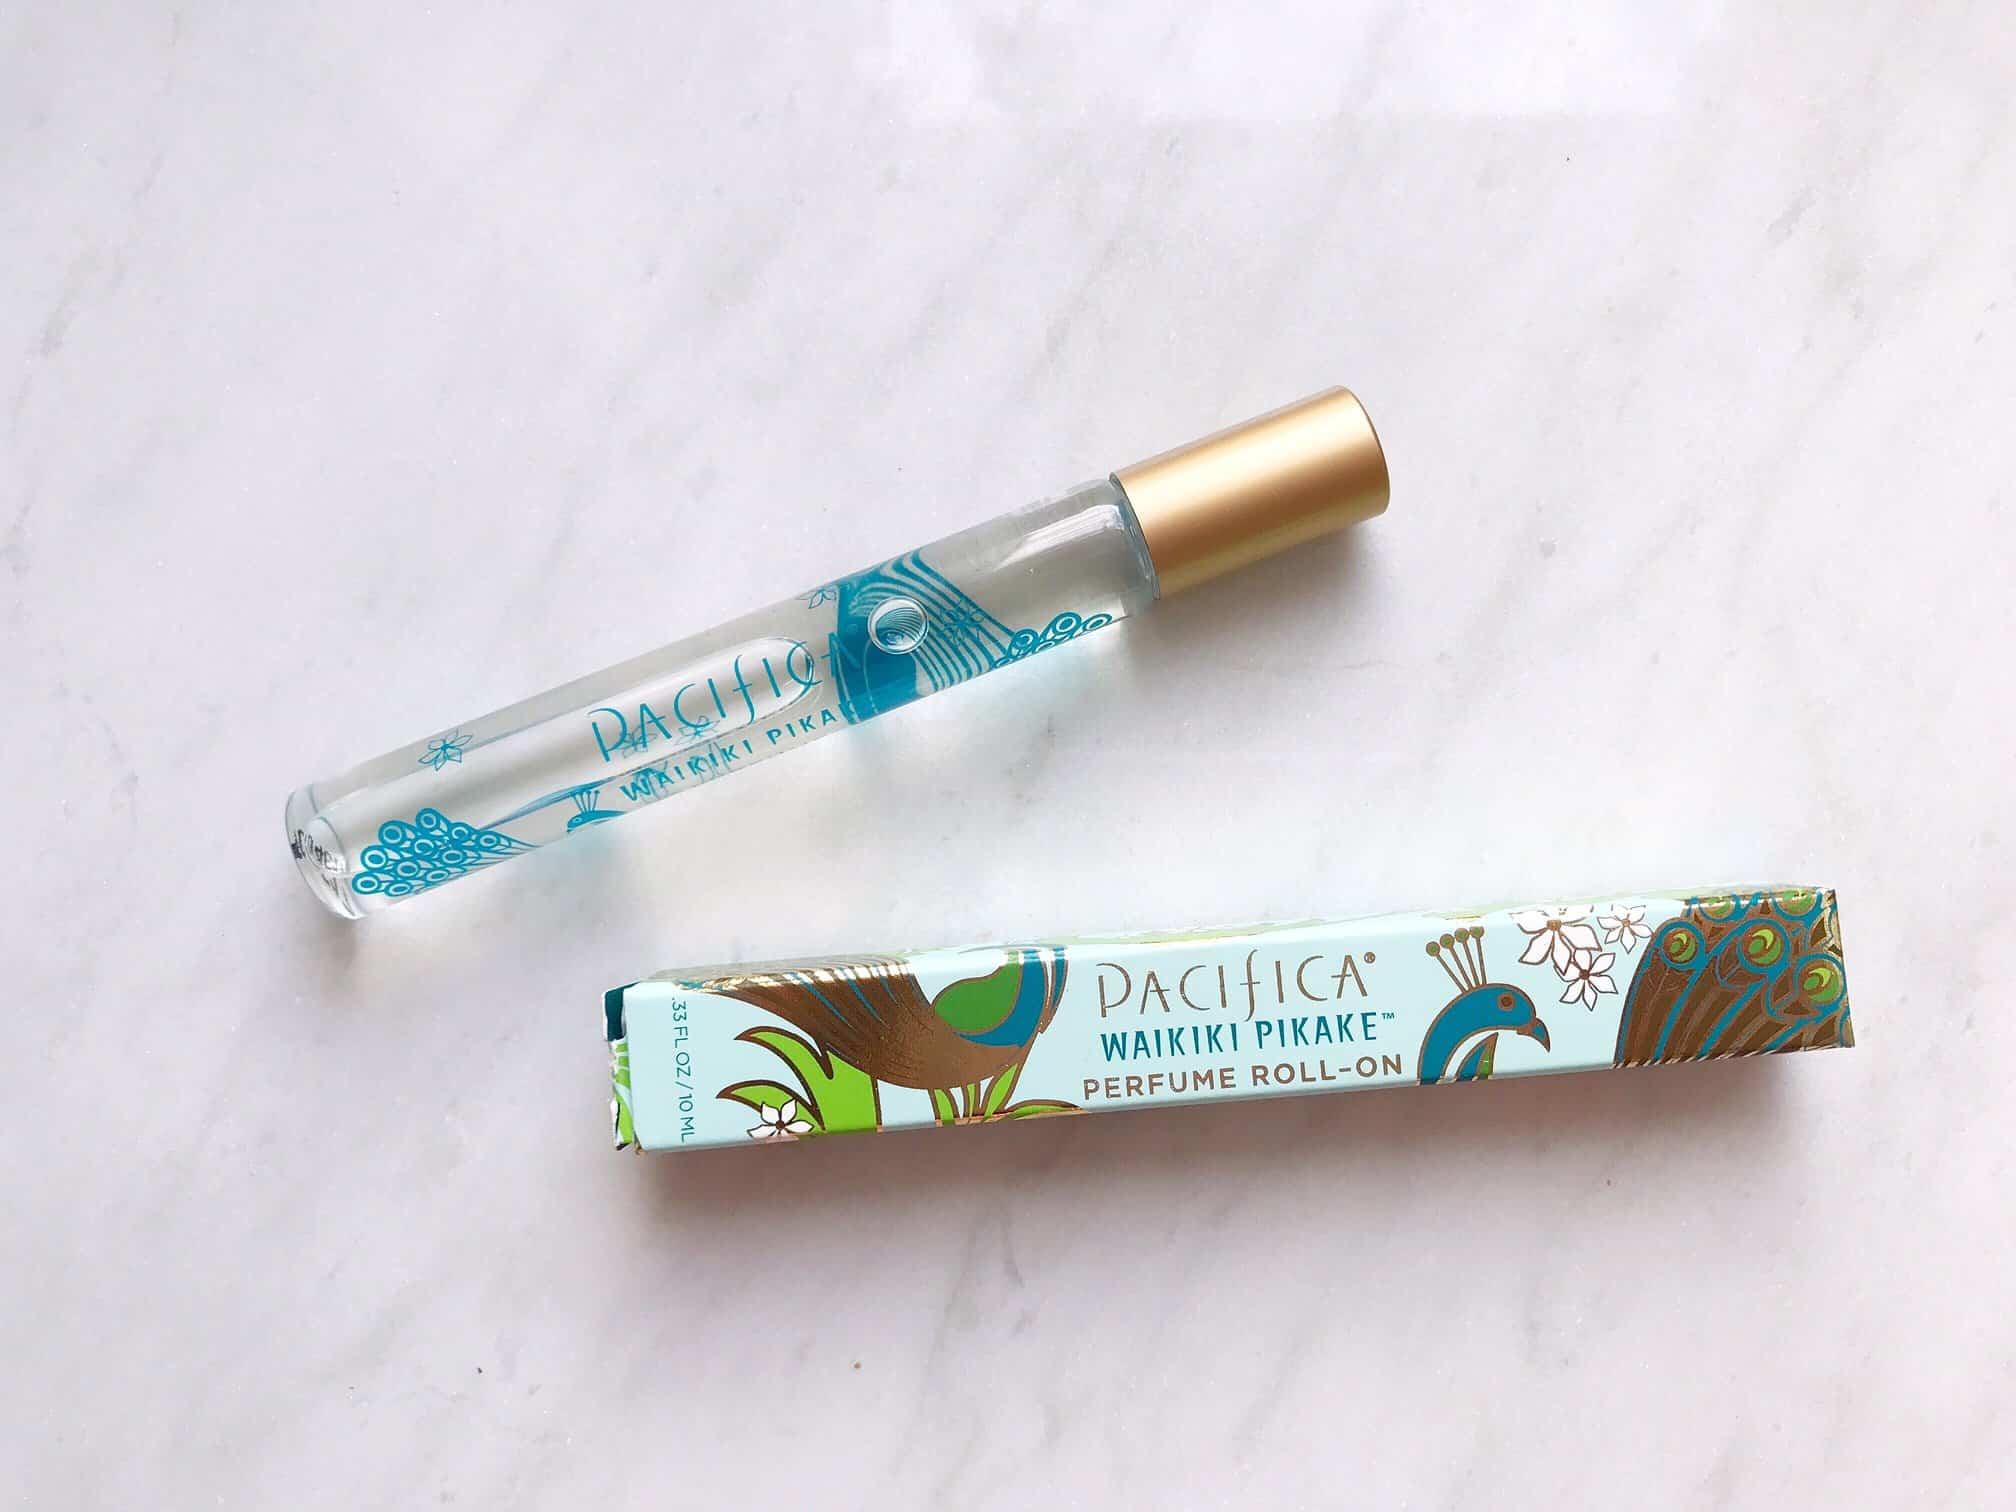 Ingredients in Pacifica Roll On Perfume in Waikiki Pikake